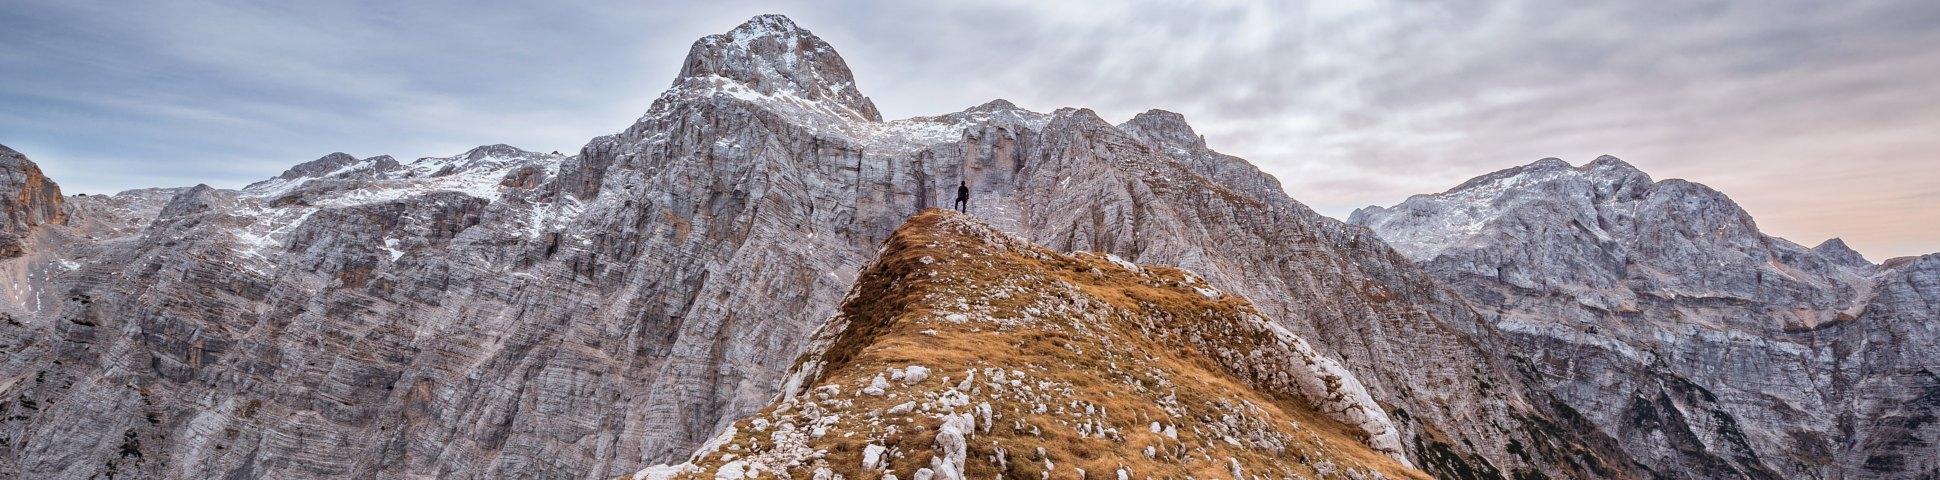 Slovenian Alps (Slovenia)